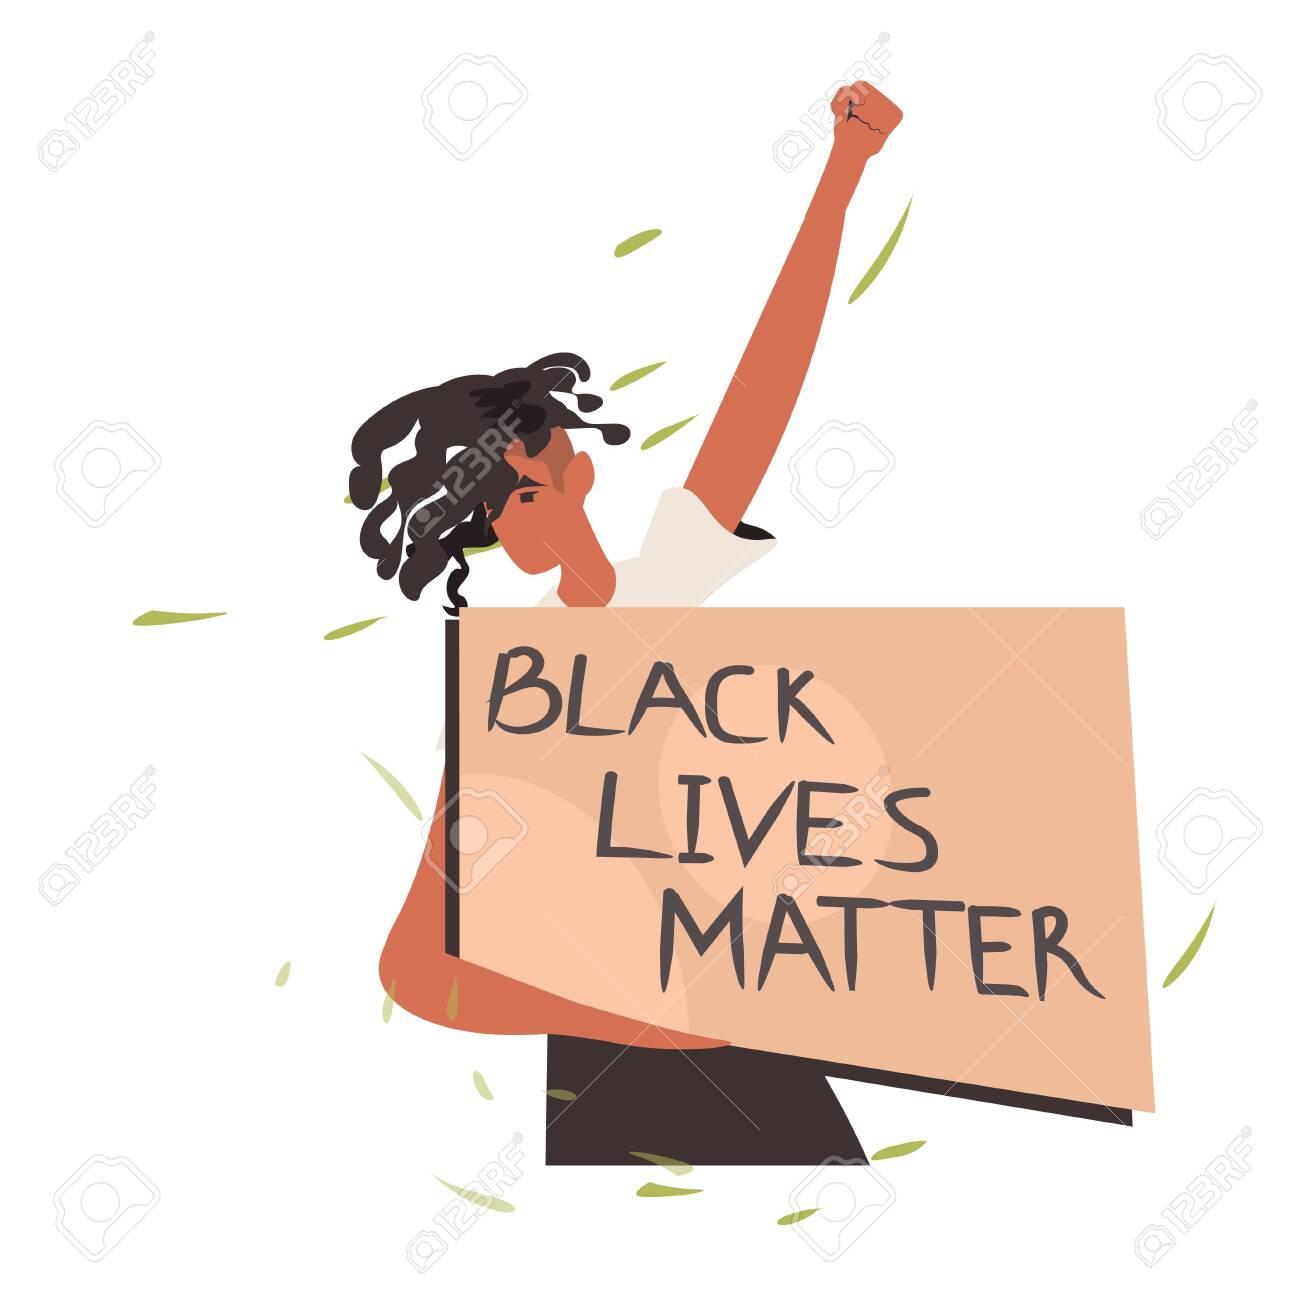 african american woman holding black lives matter banner campaign against racial discrimination of dark skin color social problems of racism portrait vector illustration - 148924110